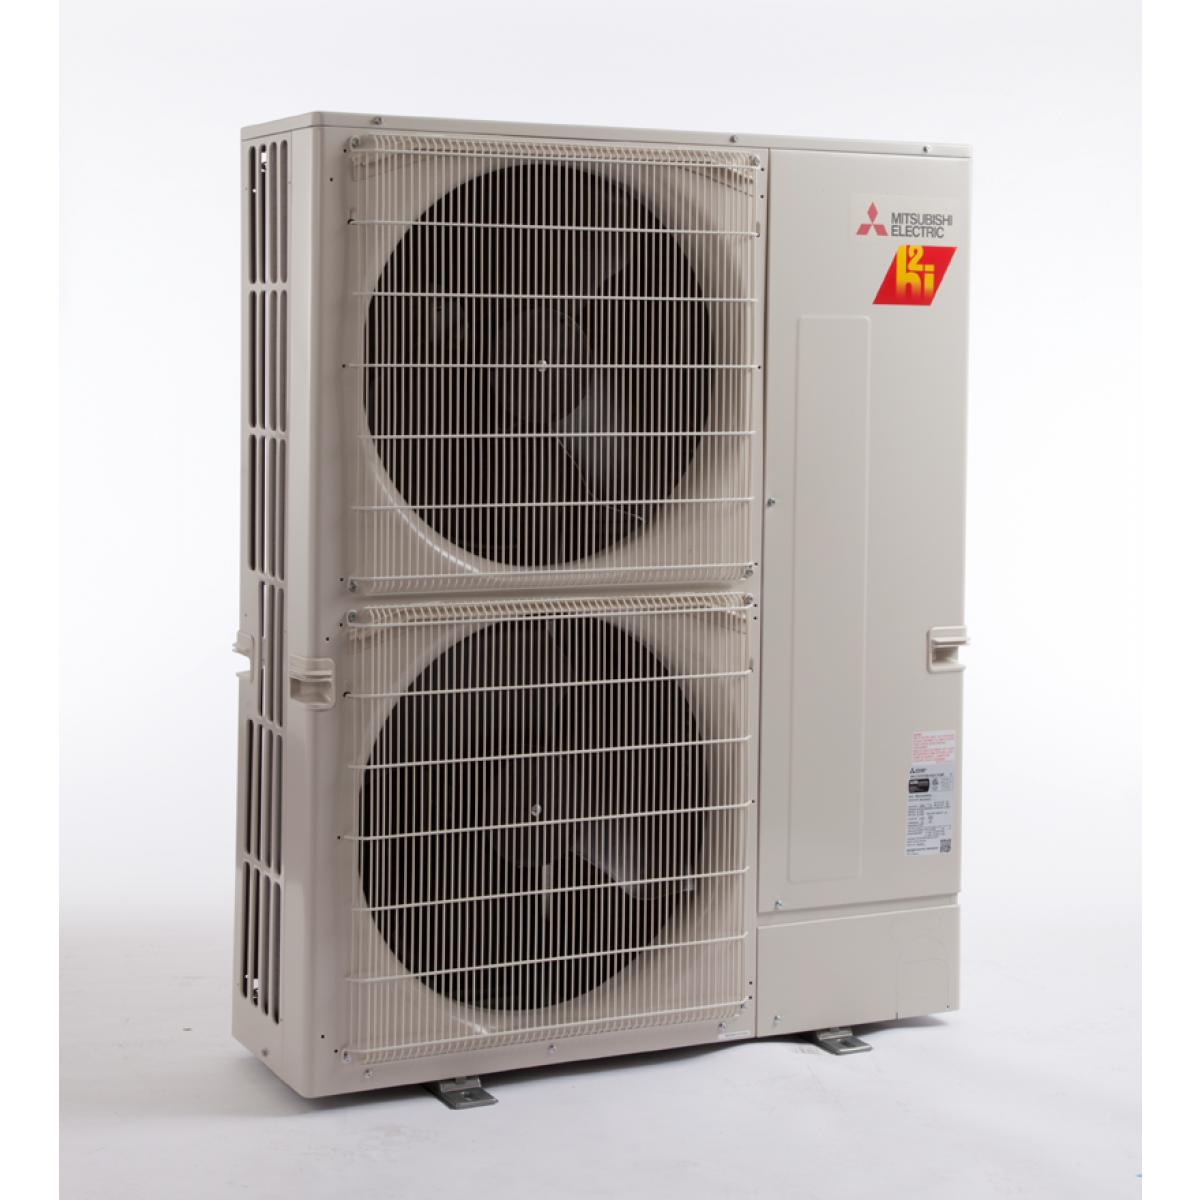 48k btu ton mitsubishi mxz hyper heat 8 zone condenser - ductless ac